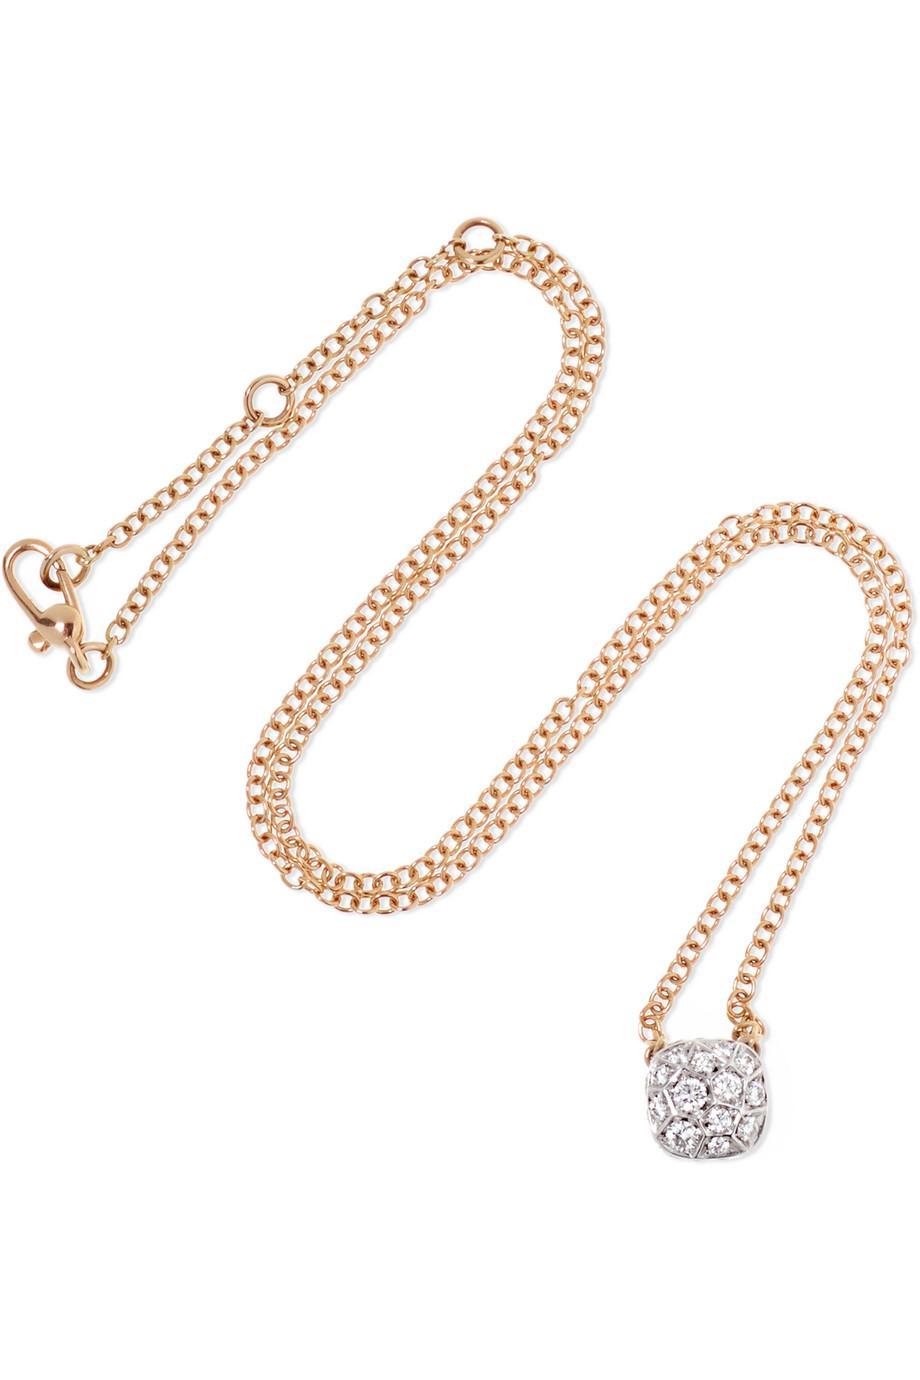 Nudo Solitaire 18-karat White And Rose Gold Diamond Necklace - White gold POMELLATO B99H7tB4